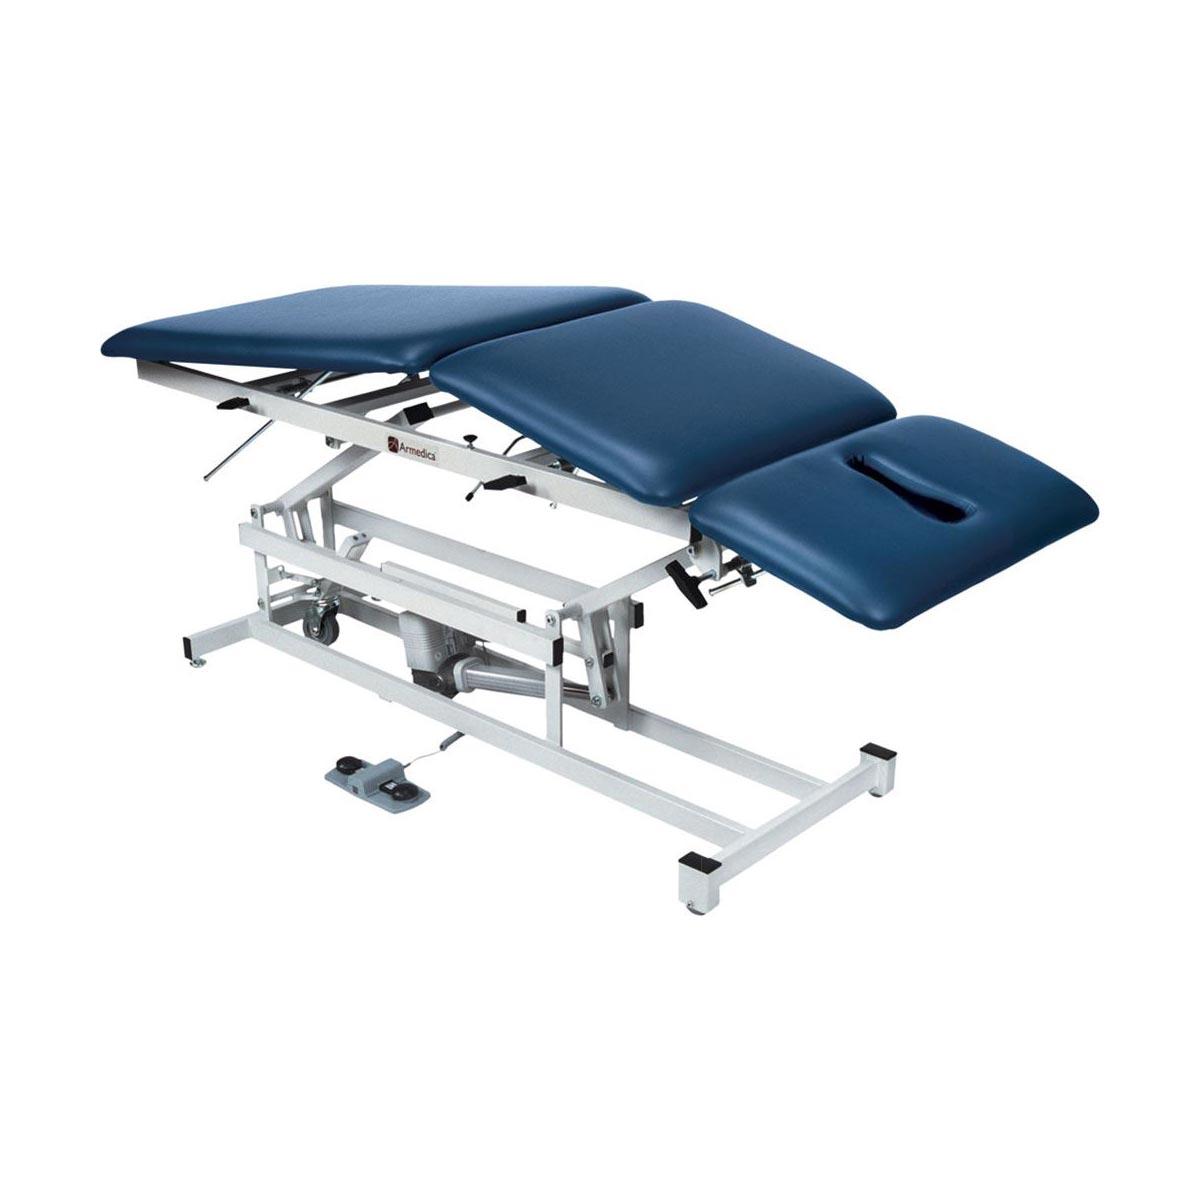 Armedica AM-BA 300 treatment table